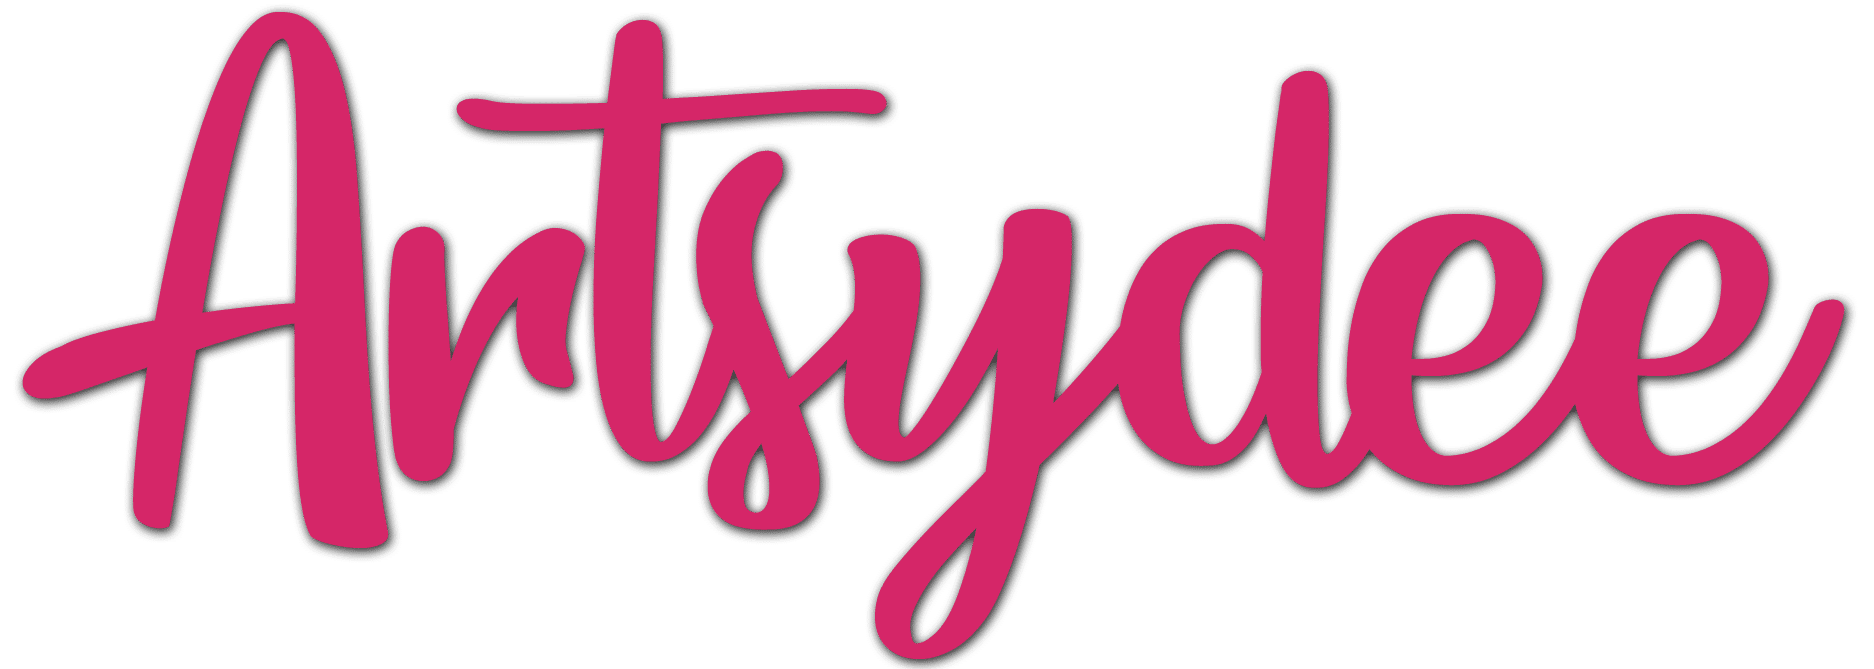 Artsydee | Drawing, Painting, Craft & Creativity